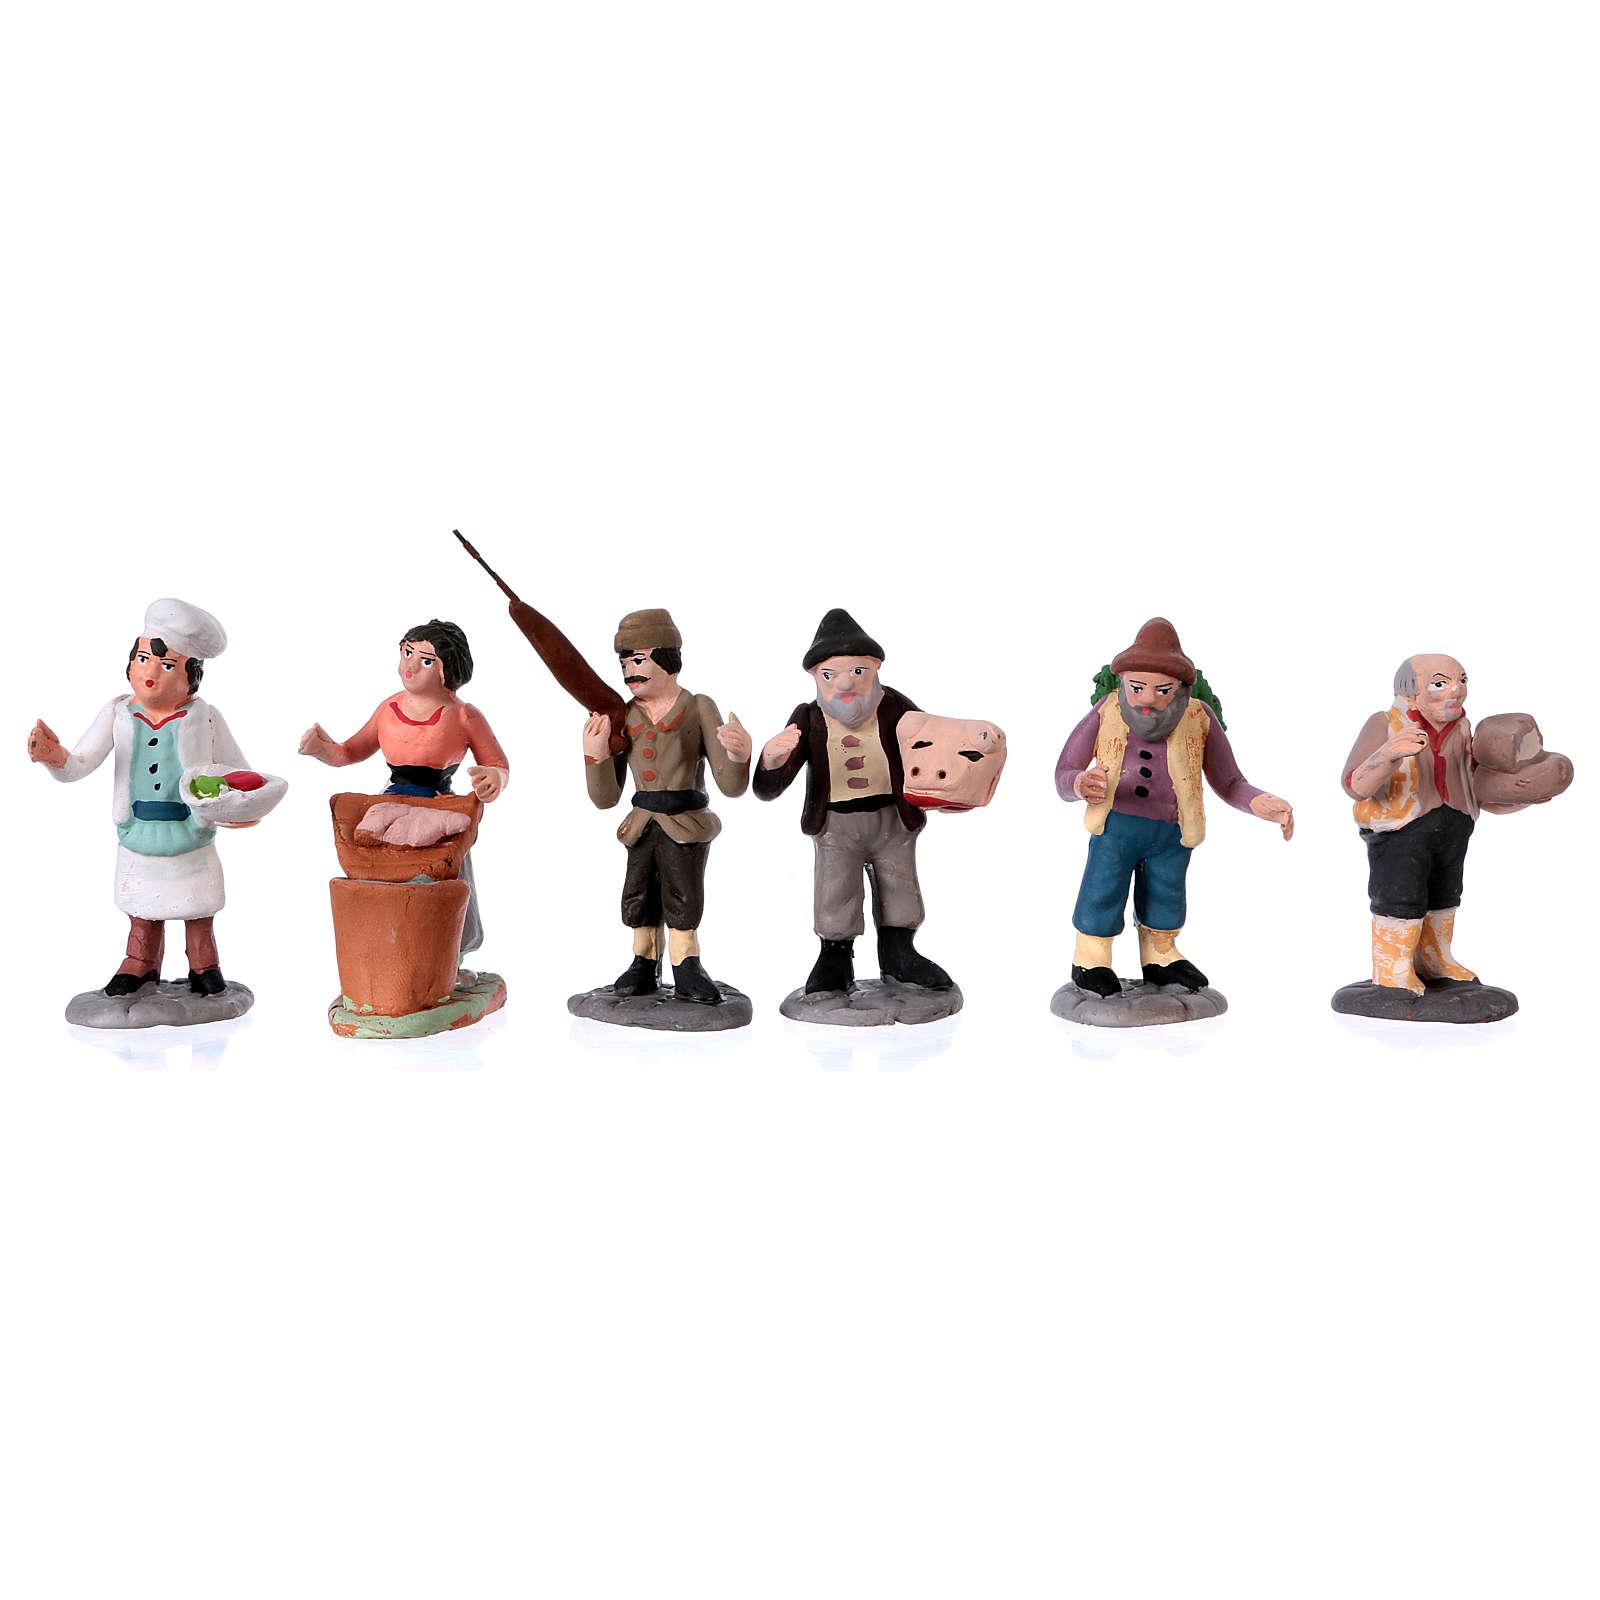 Neapolitan Nativity Scene 7 cm terracotta figurines, set of 36 4